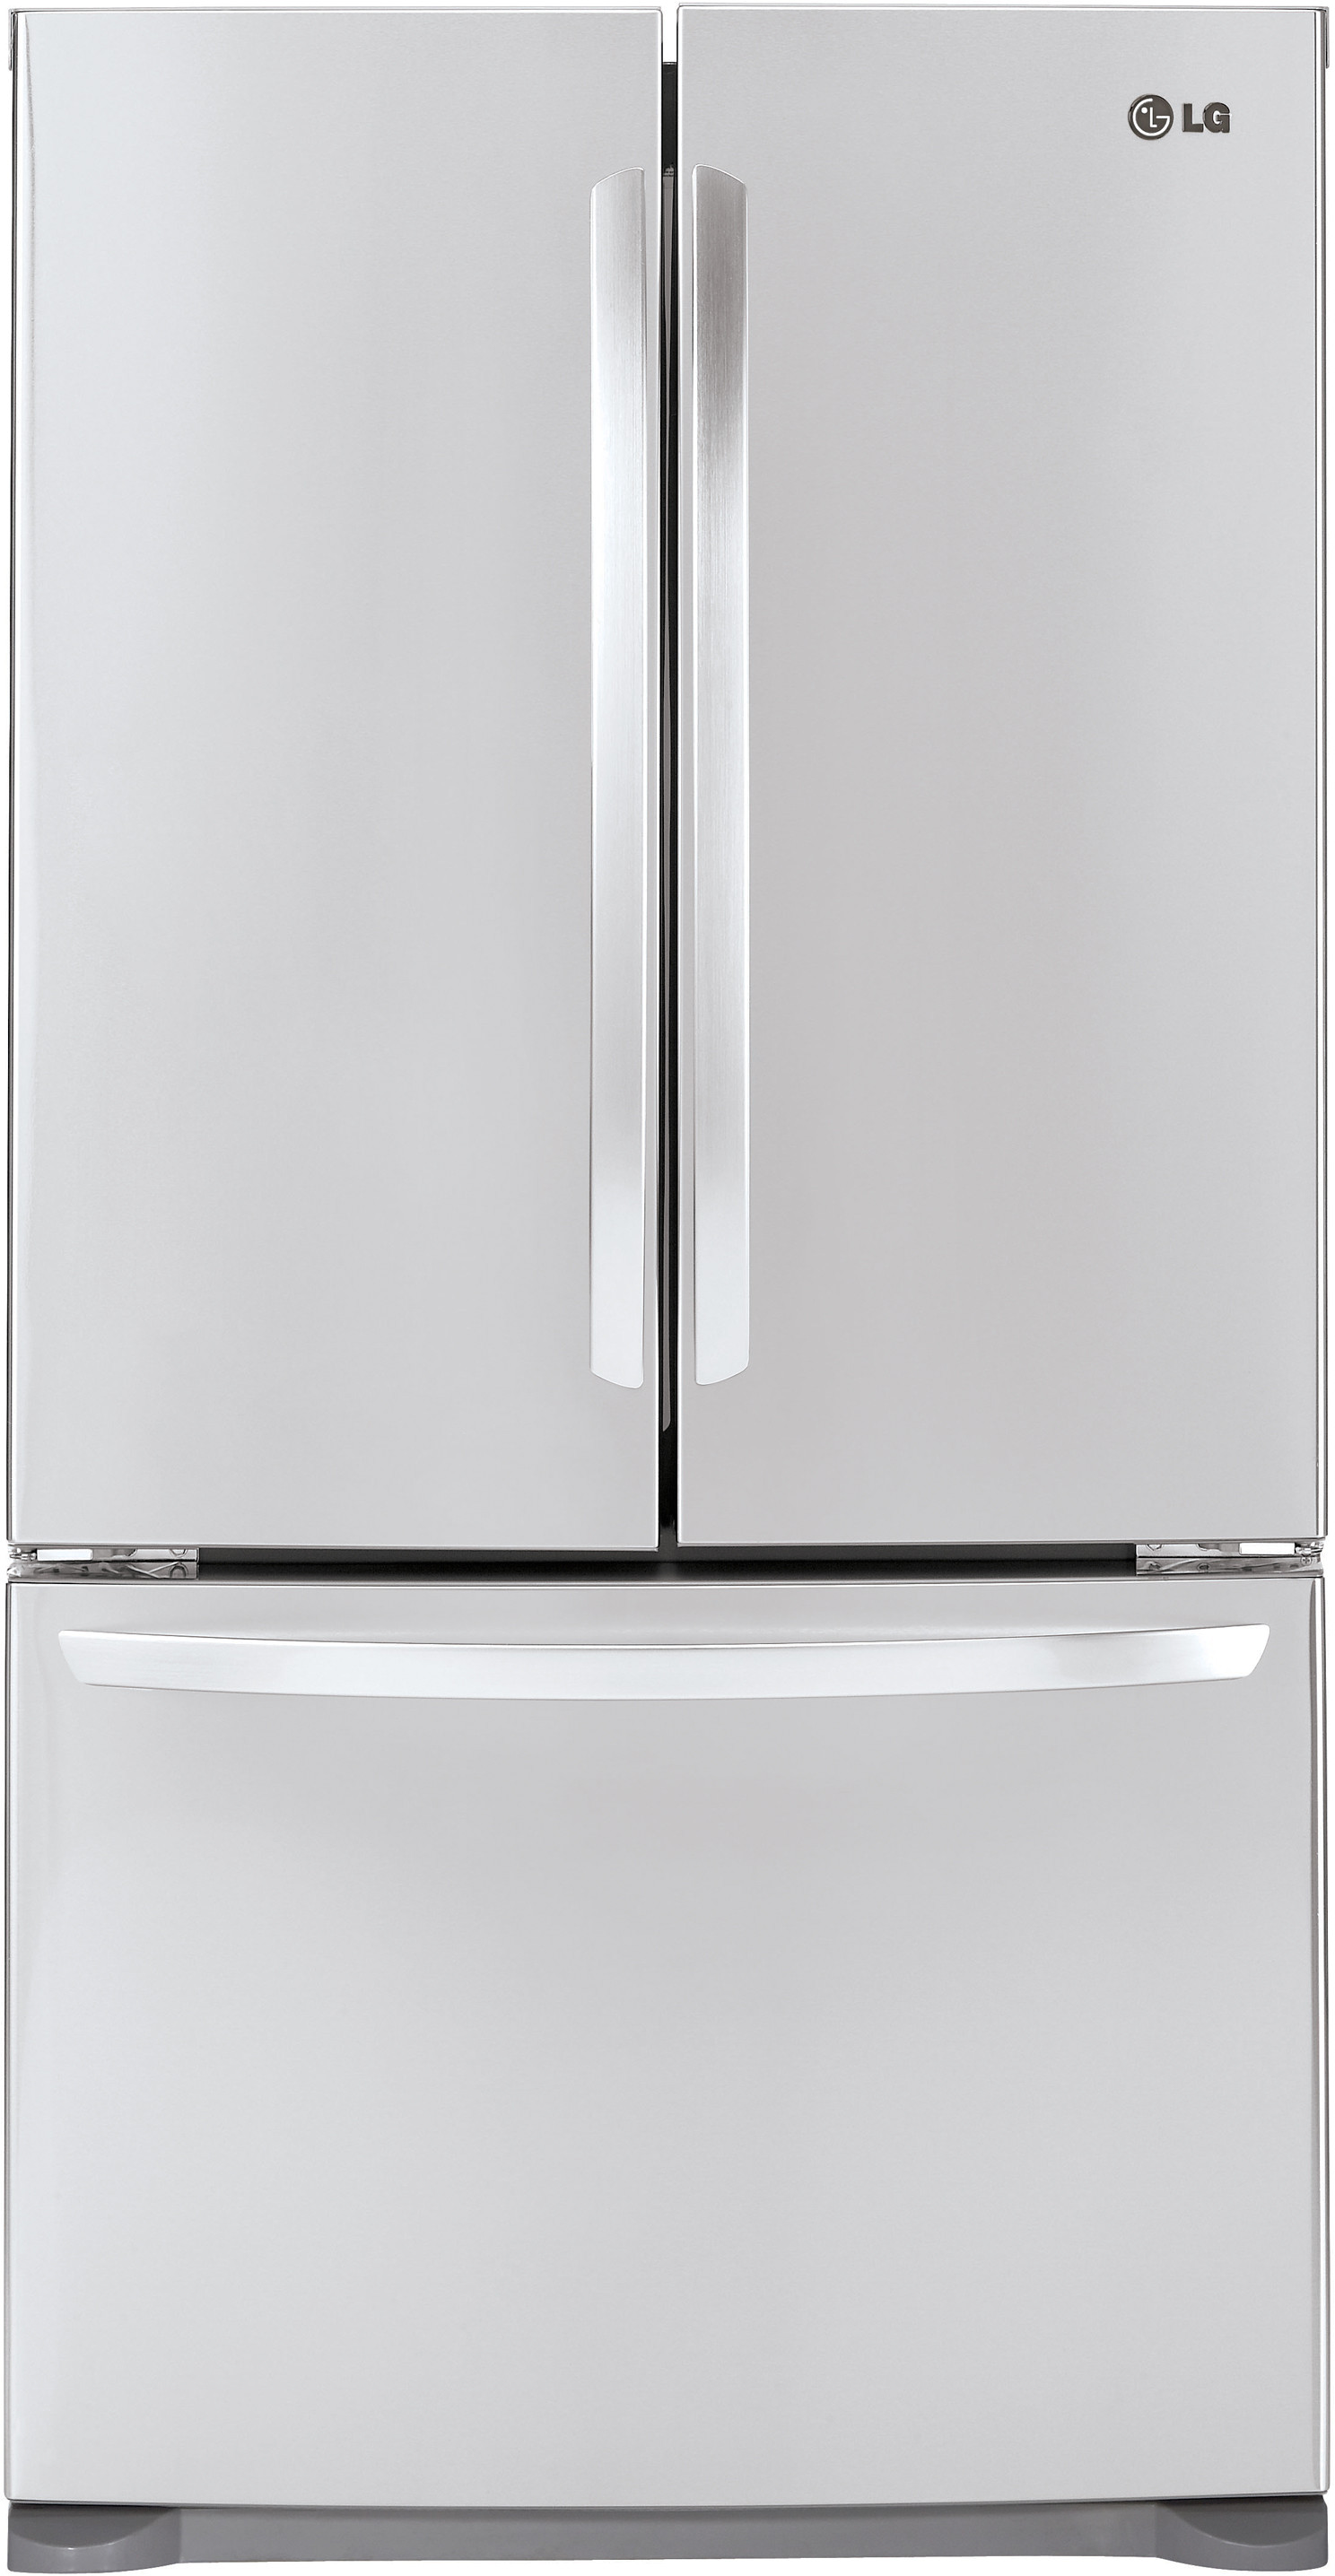 kitchenaid refrigerator reviews best bottom freezer refrigerator best buy refrigerators